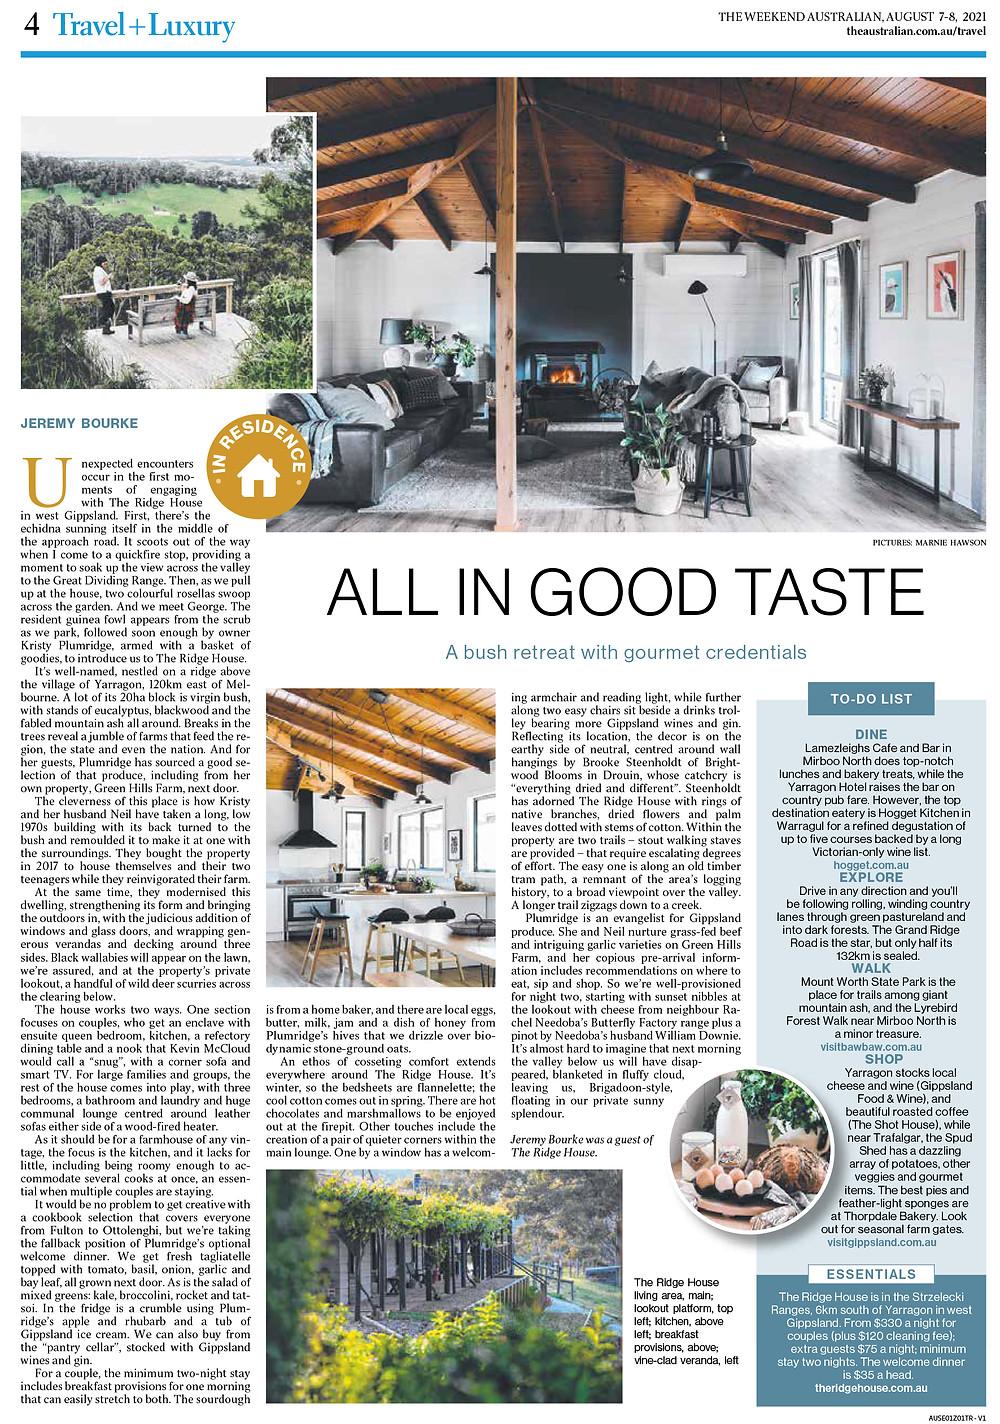 All in good taste, The Ridge House, Weekend Australian